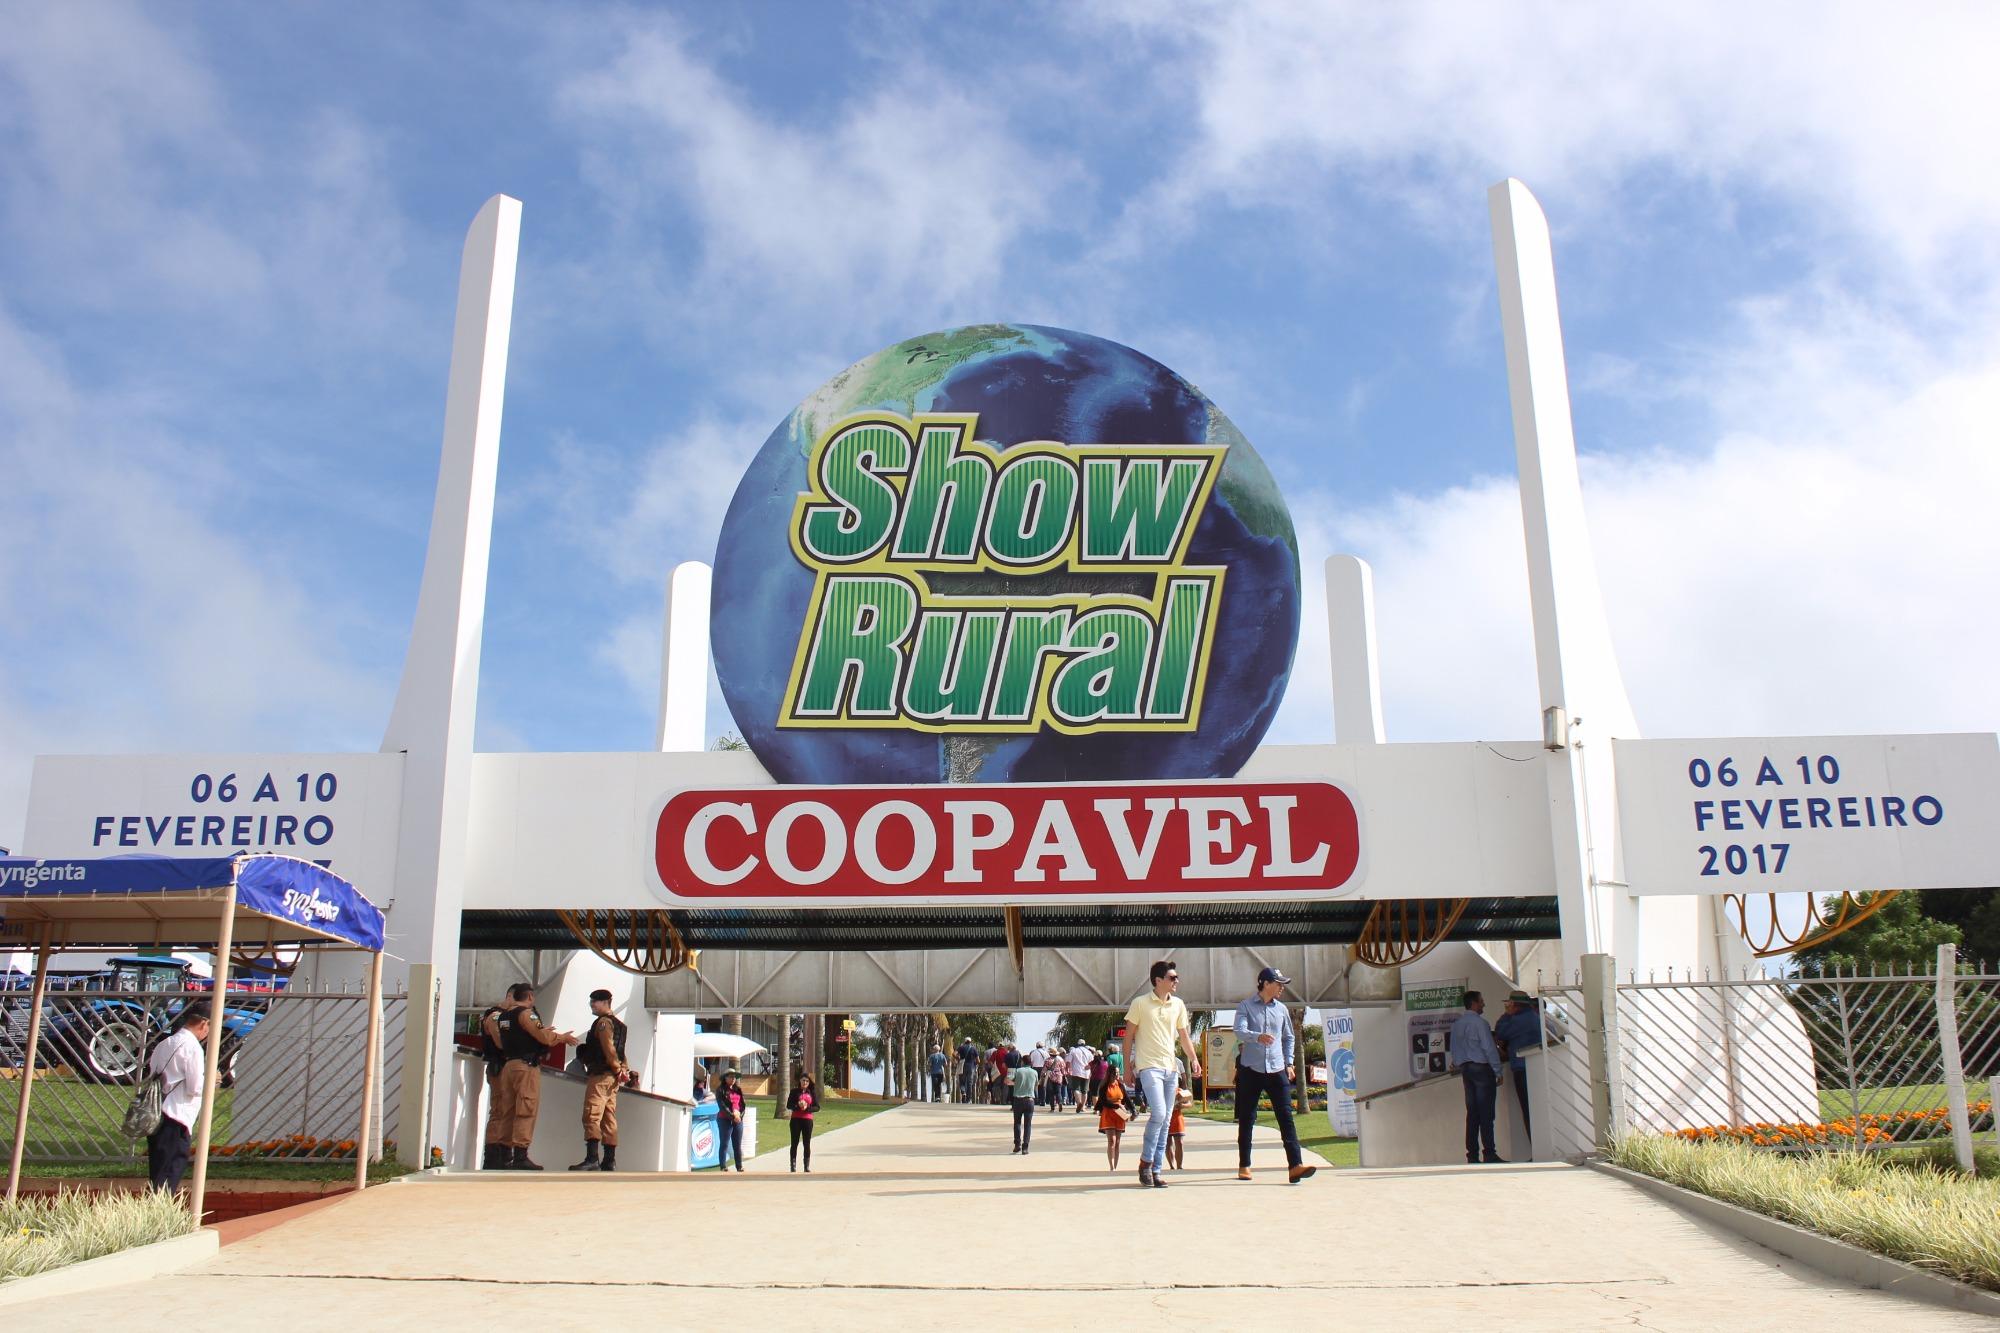 Recorde de público, Show Rural Coopavel atrai 253.068 visitantes